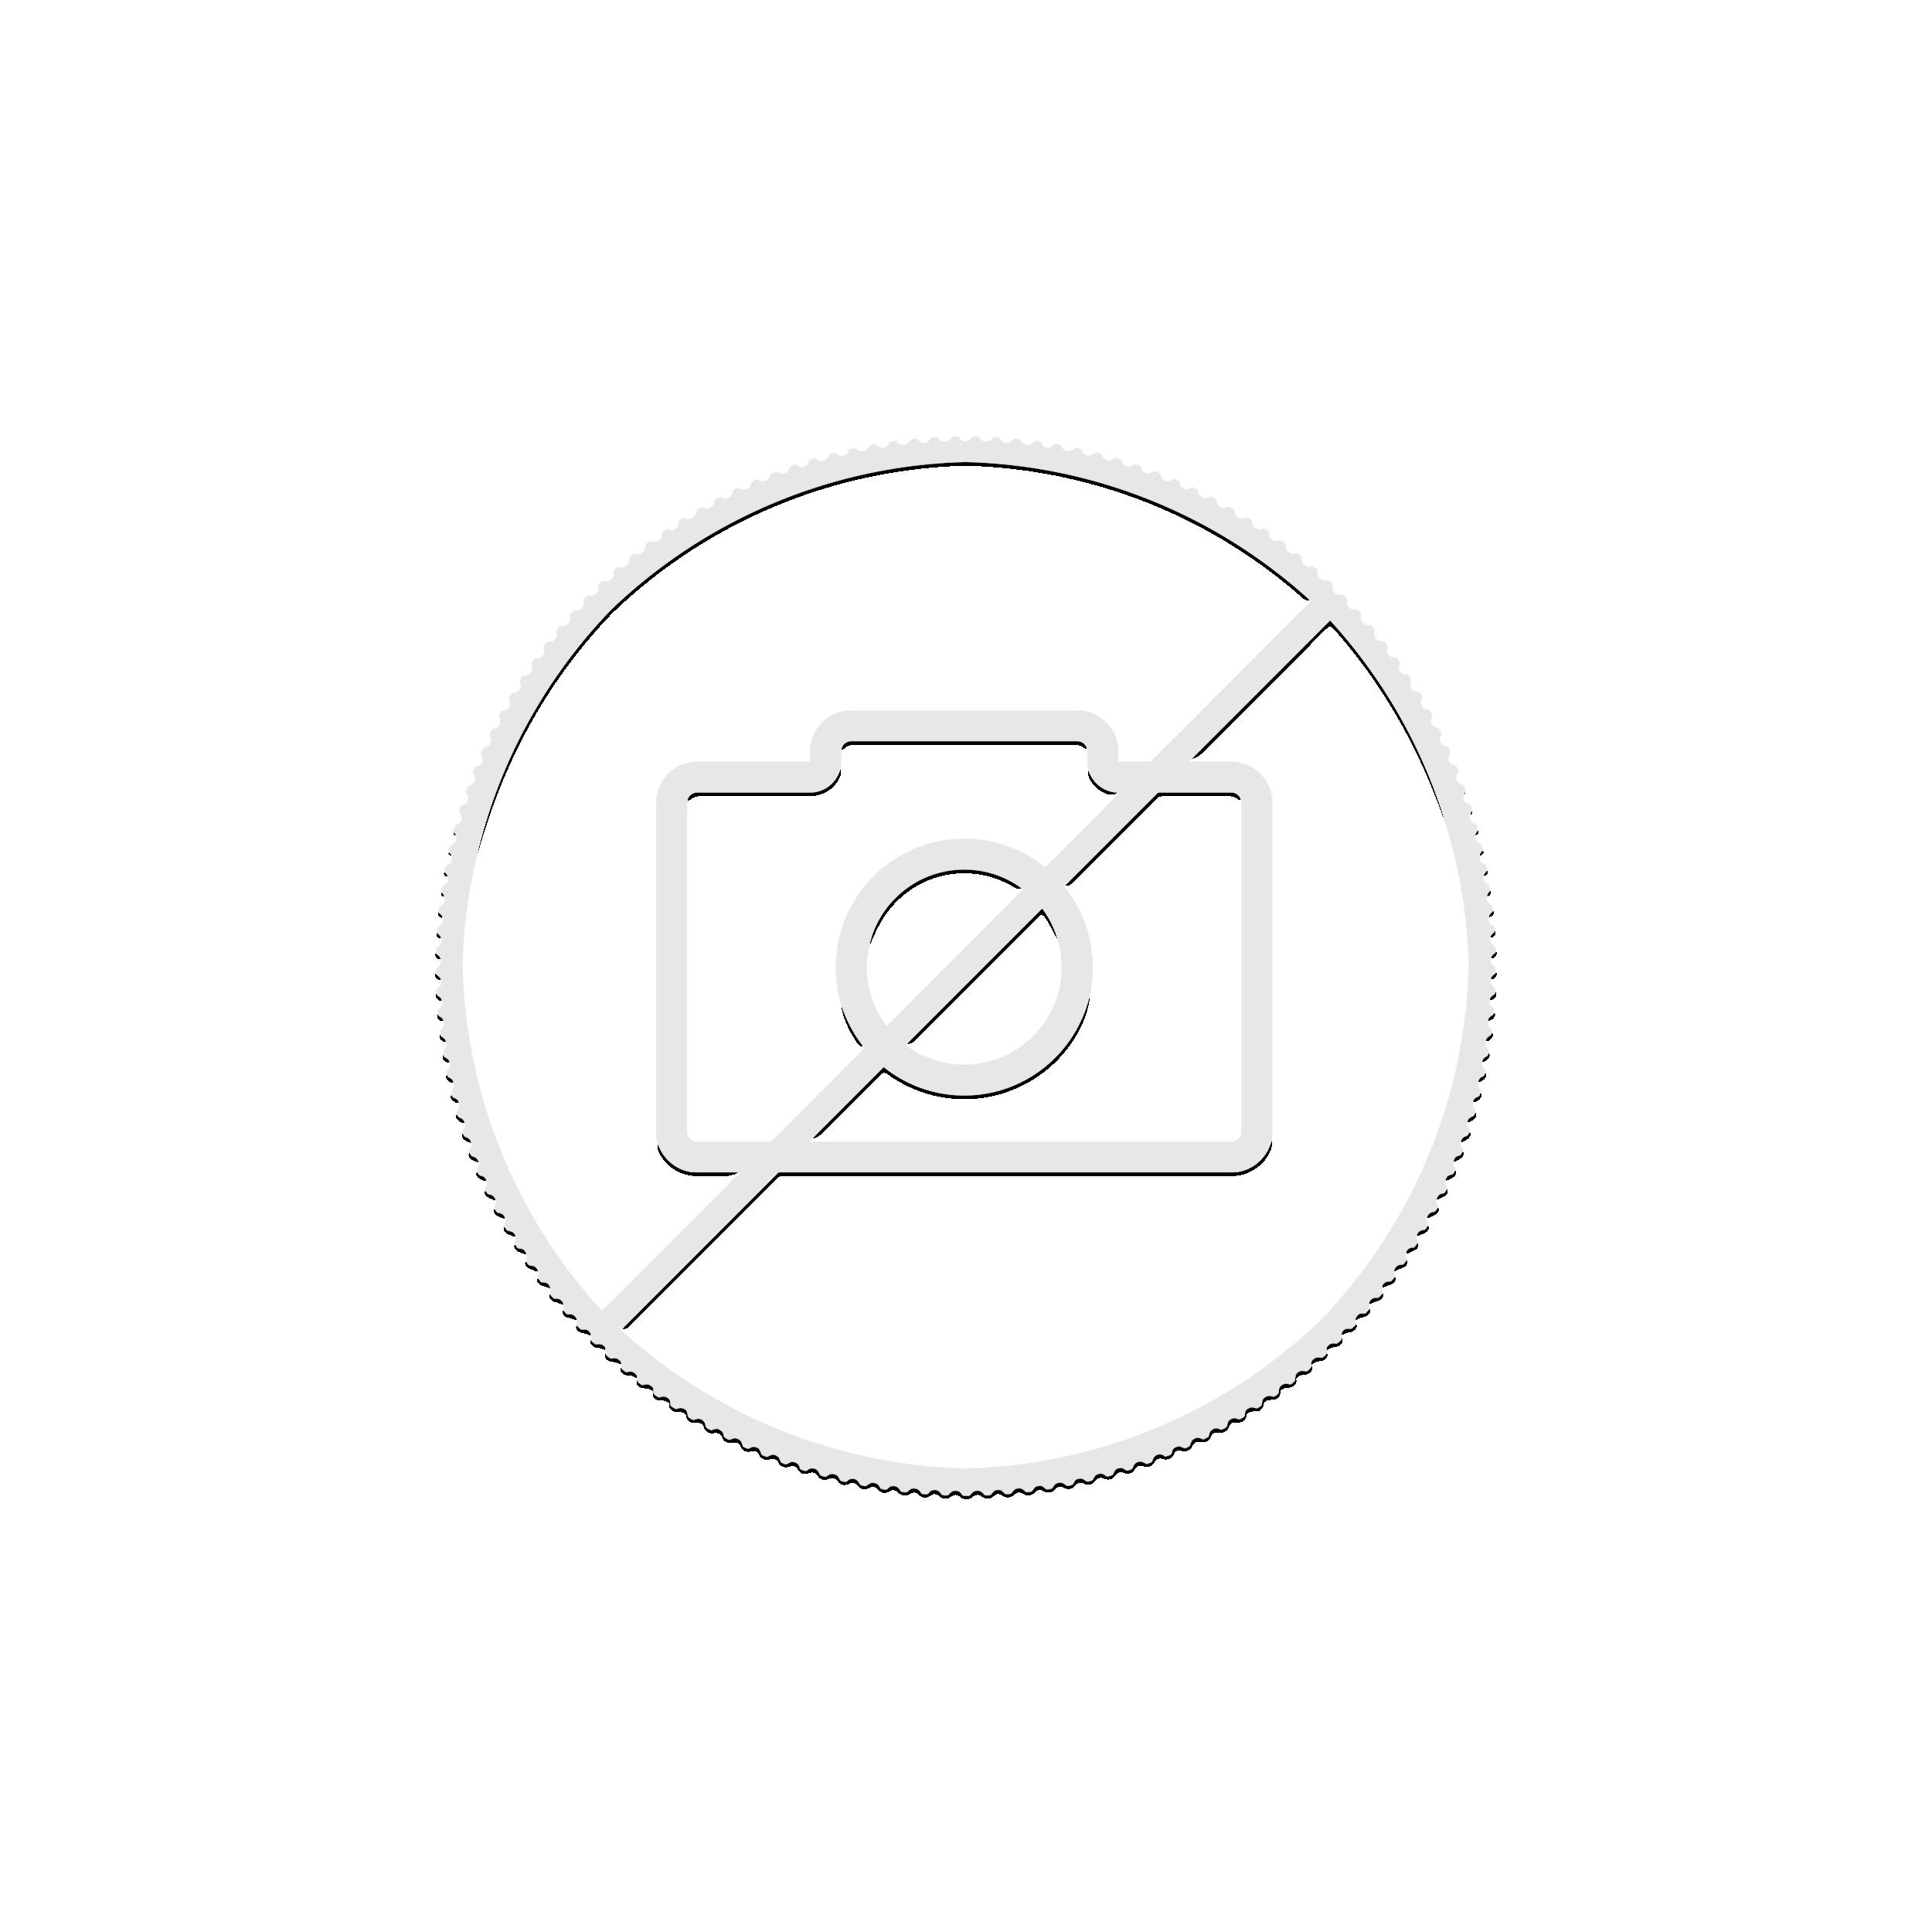 30 Gram gouden Panda munt 2016